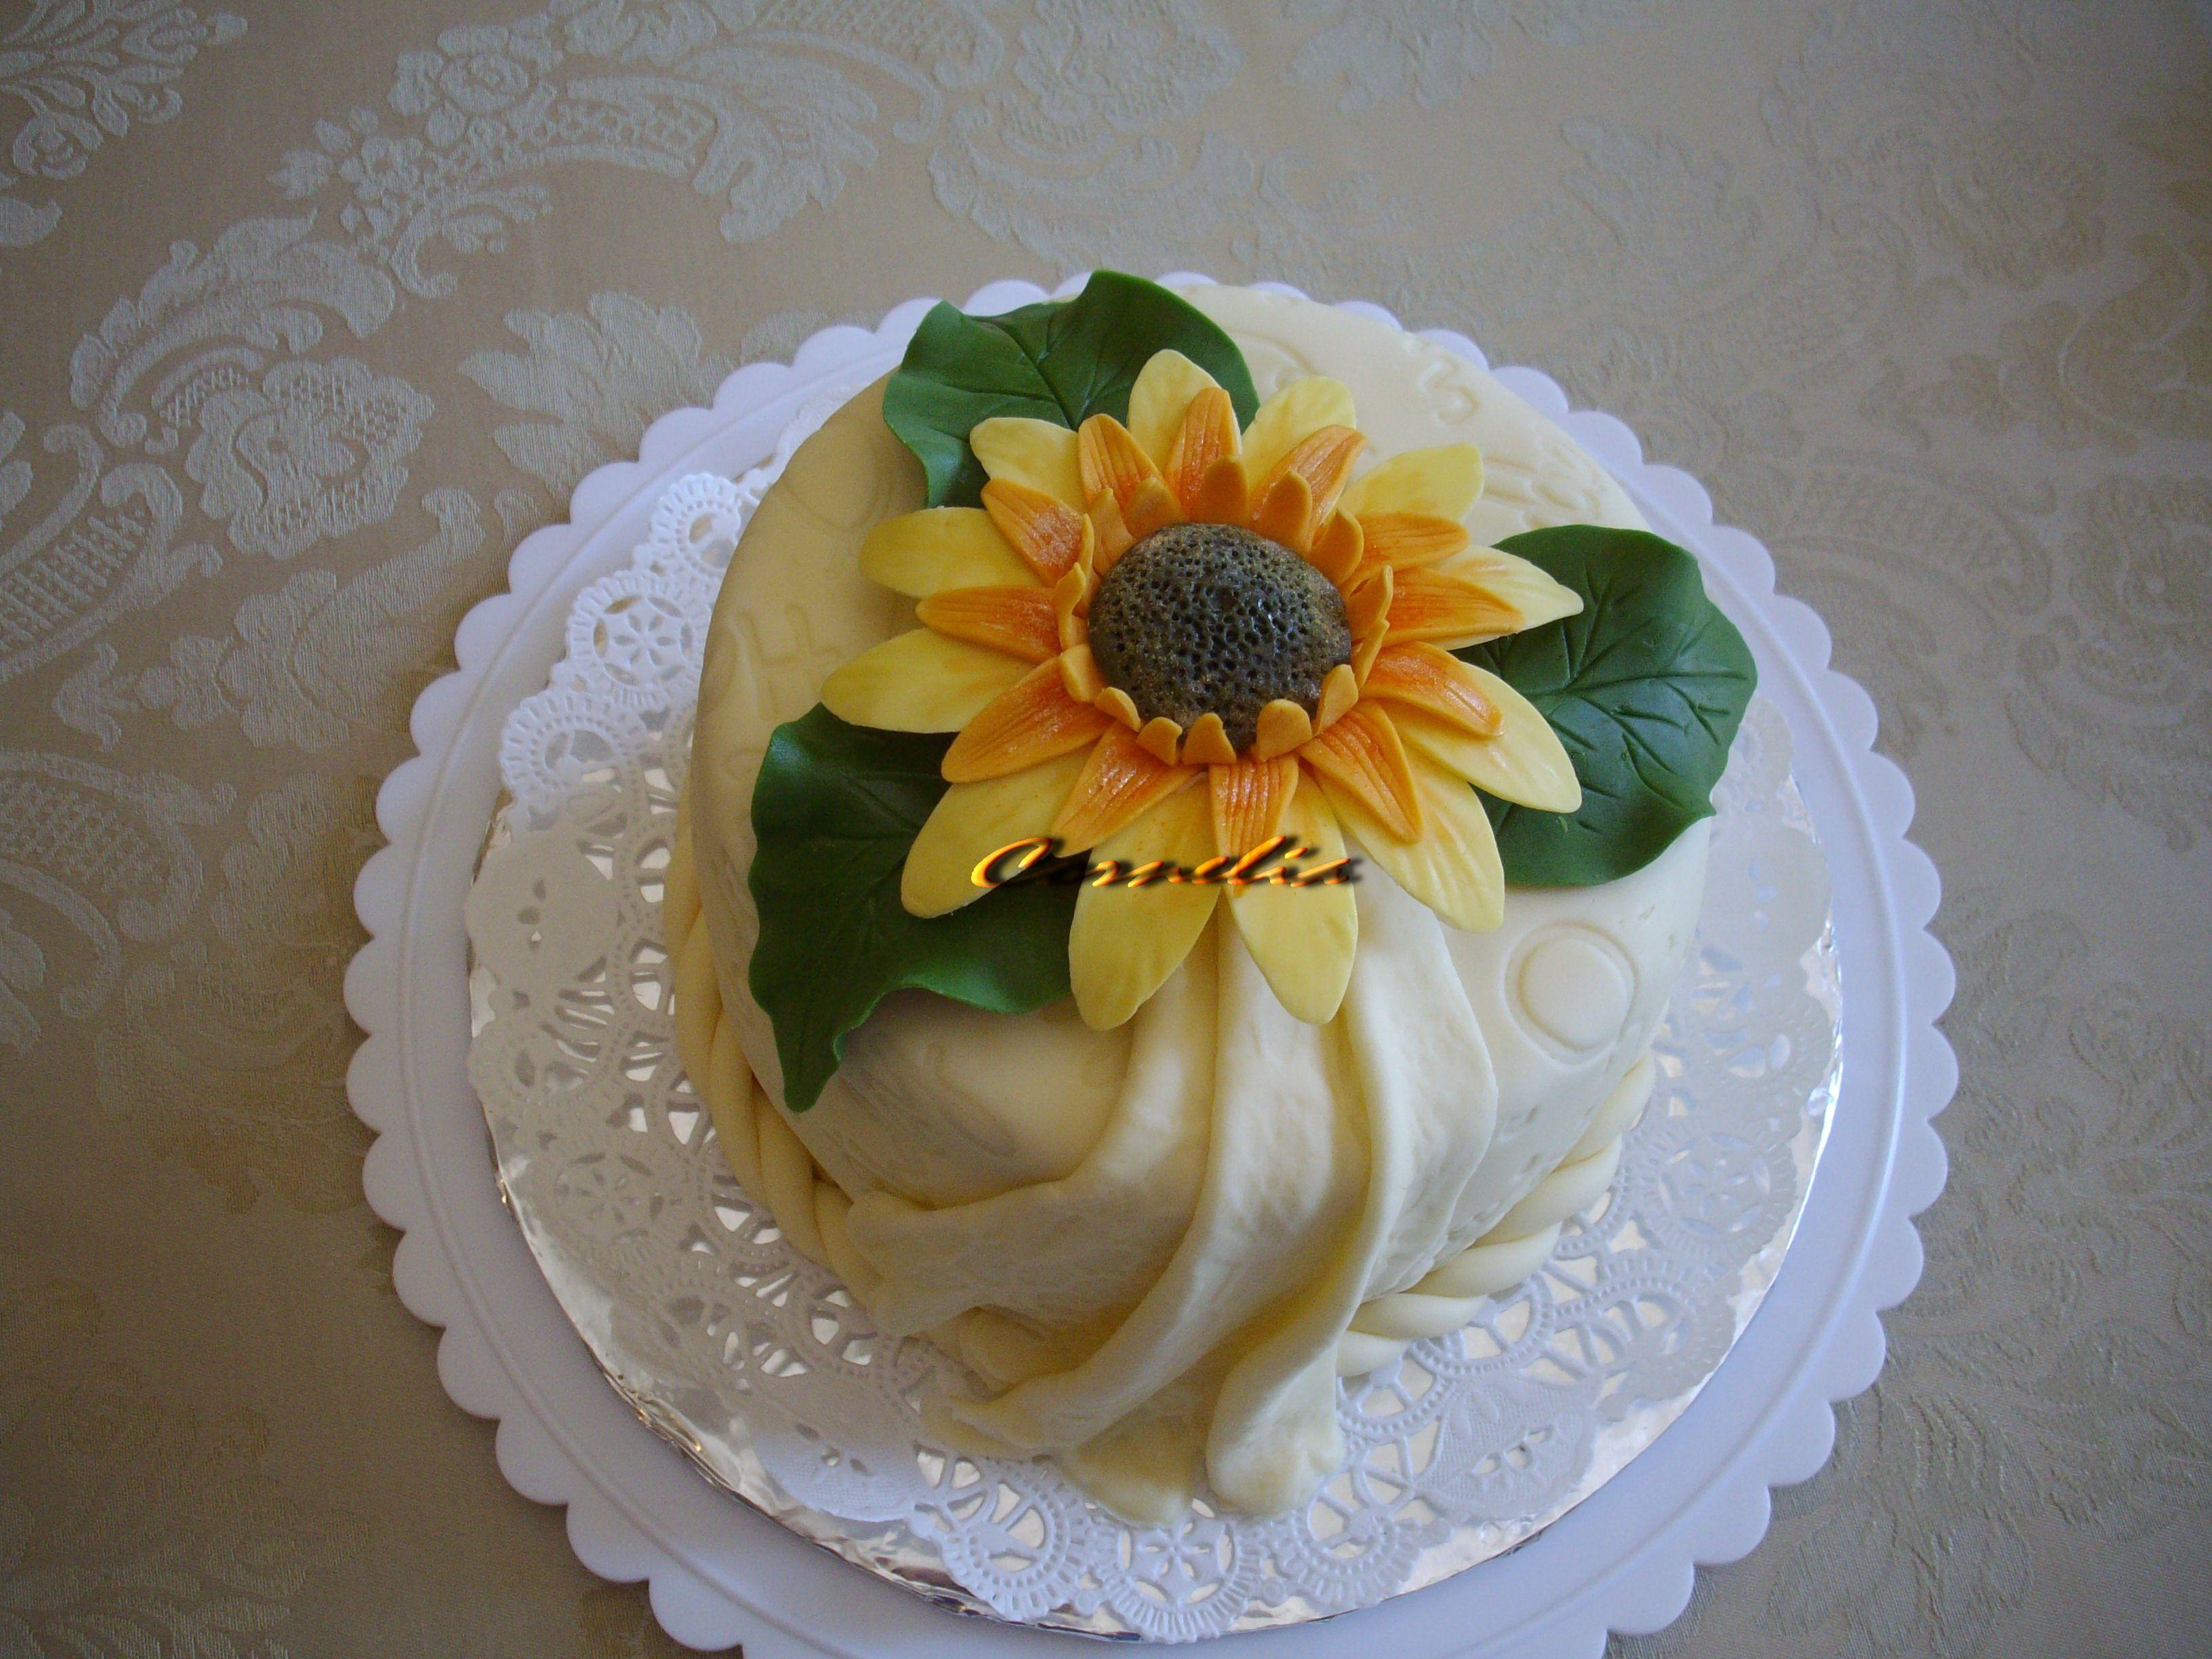 Sunflower Sheet Cake Decorating Ideas 117634 | Sunflower Cak